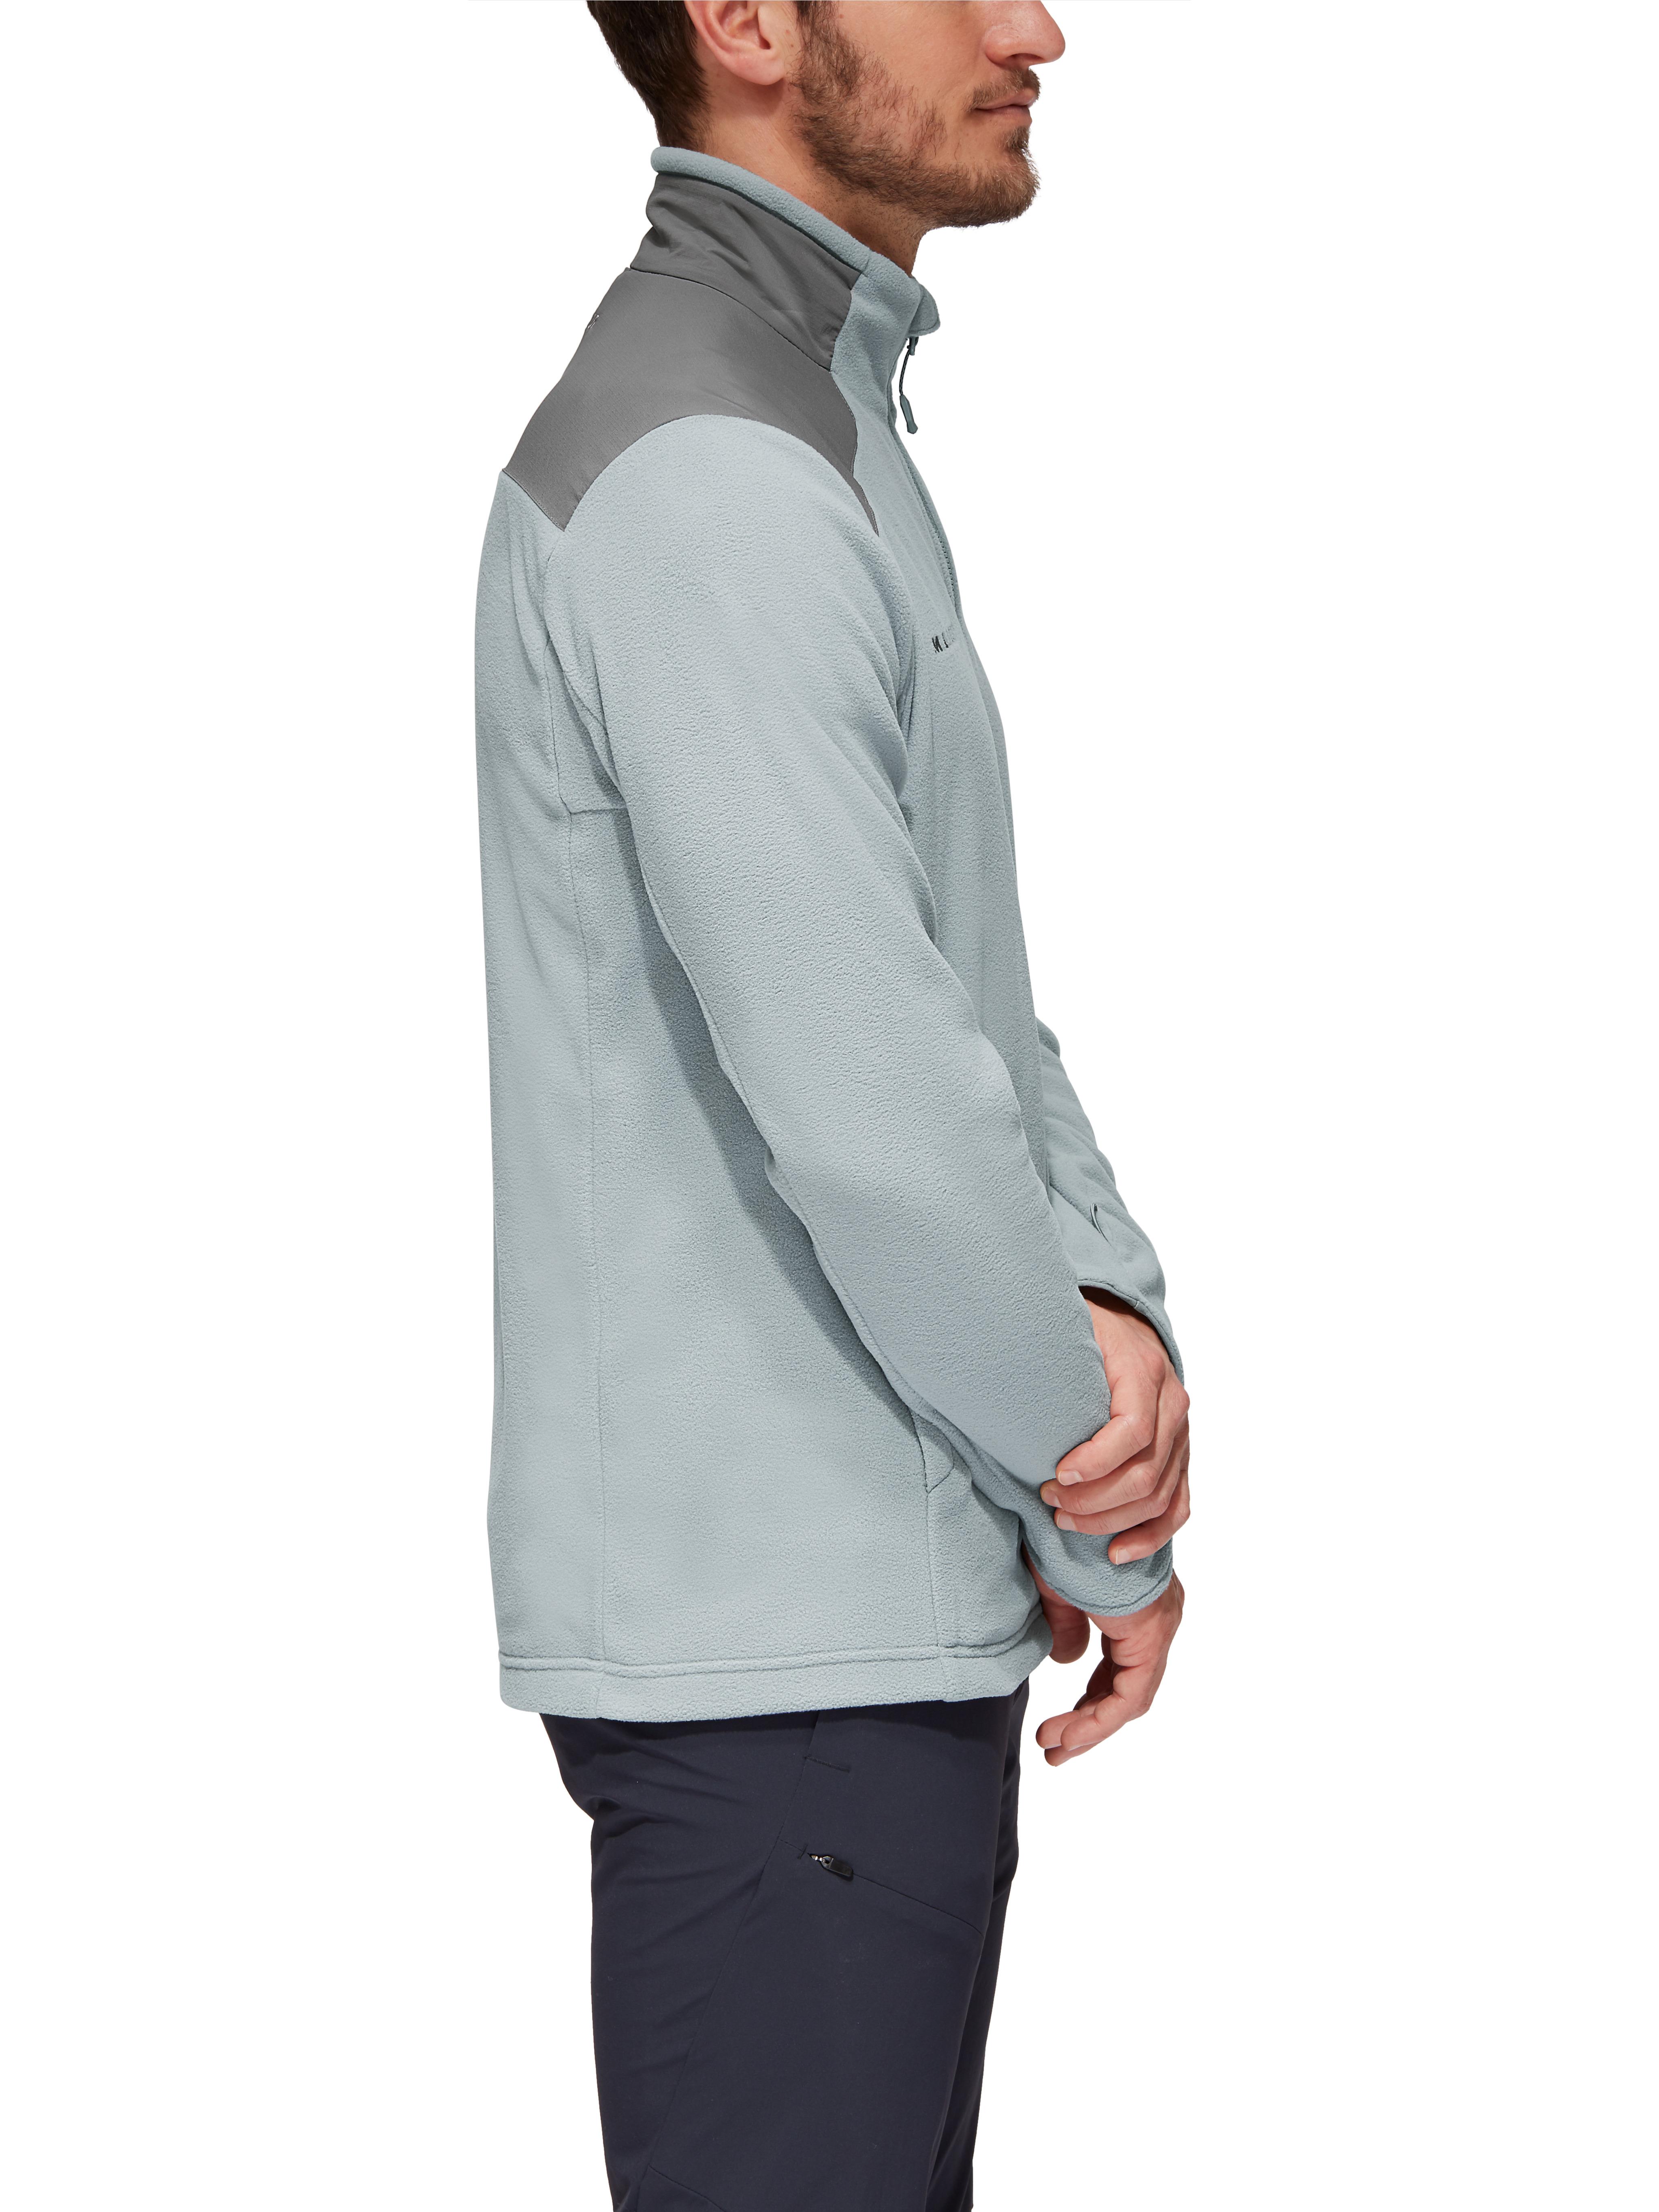 Innominata Light ML Jacket Men product image